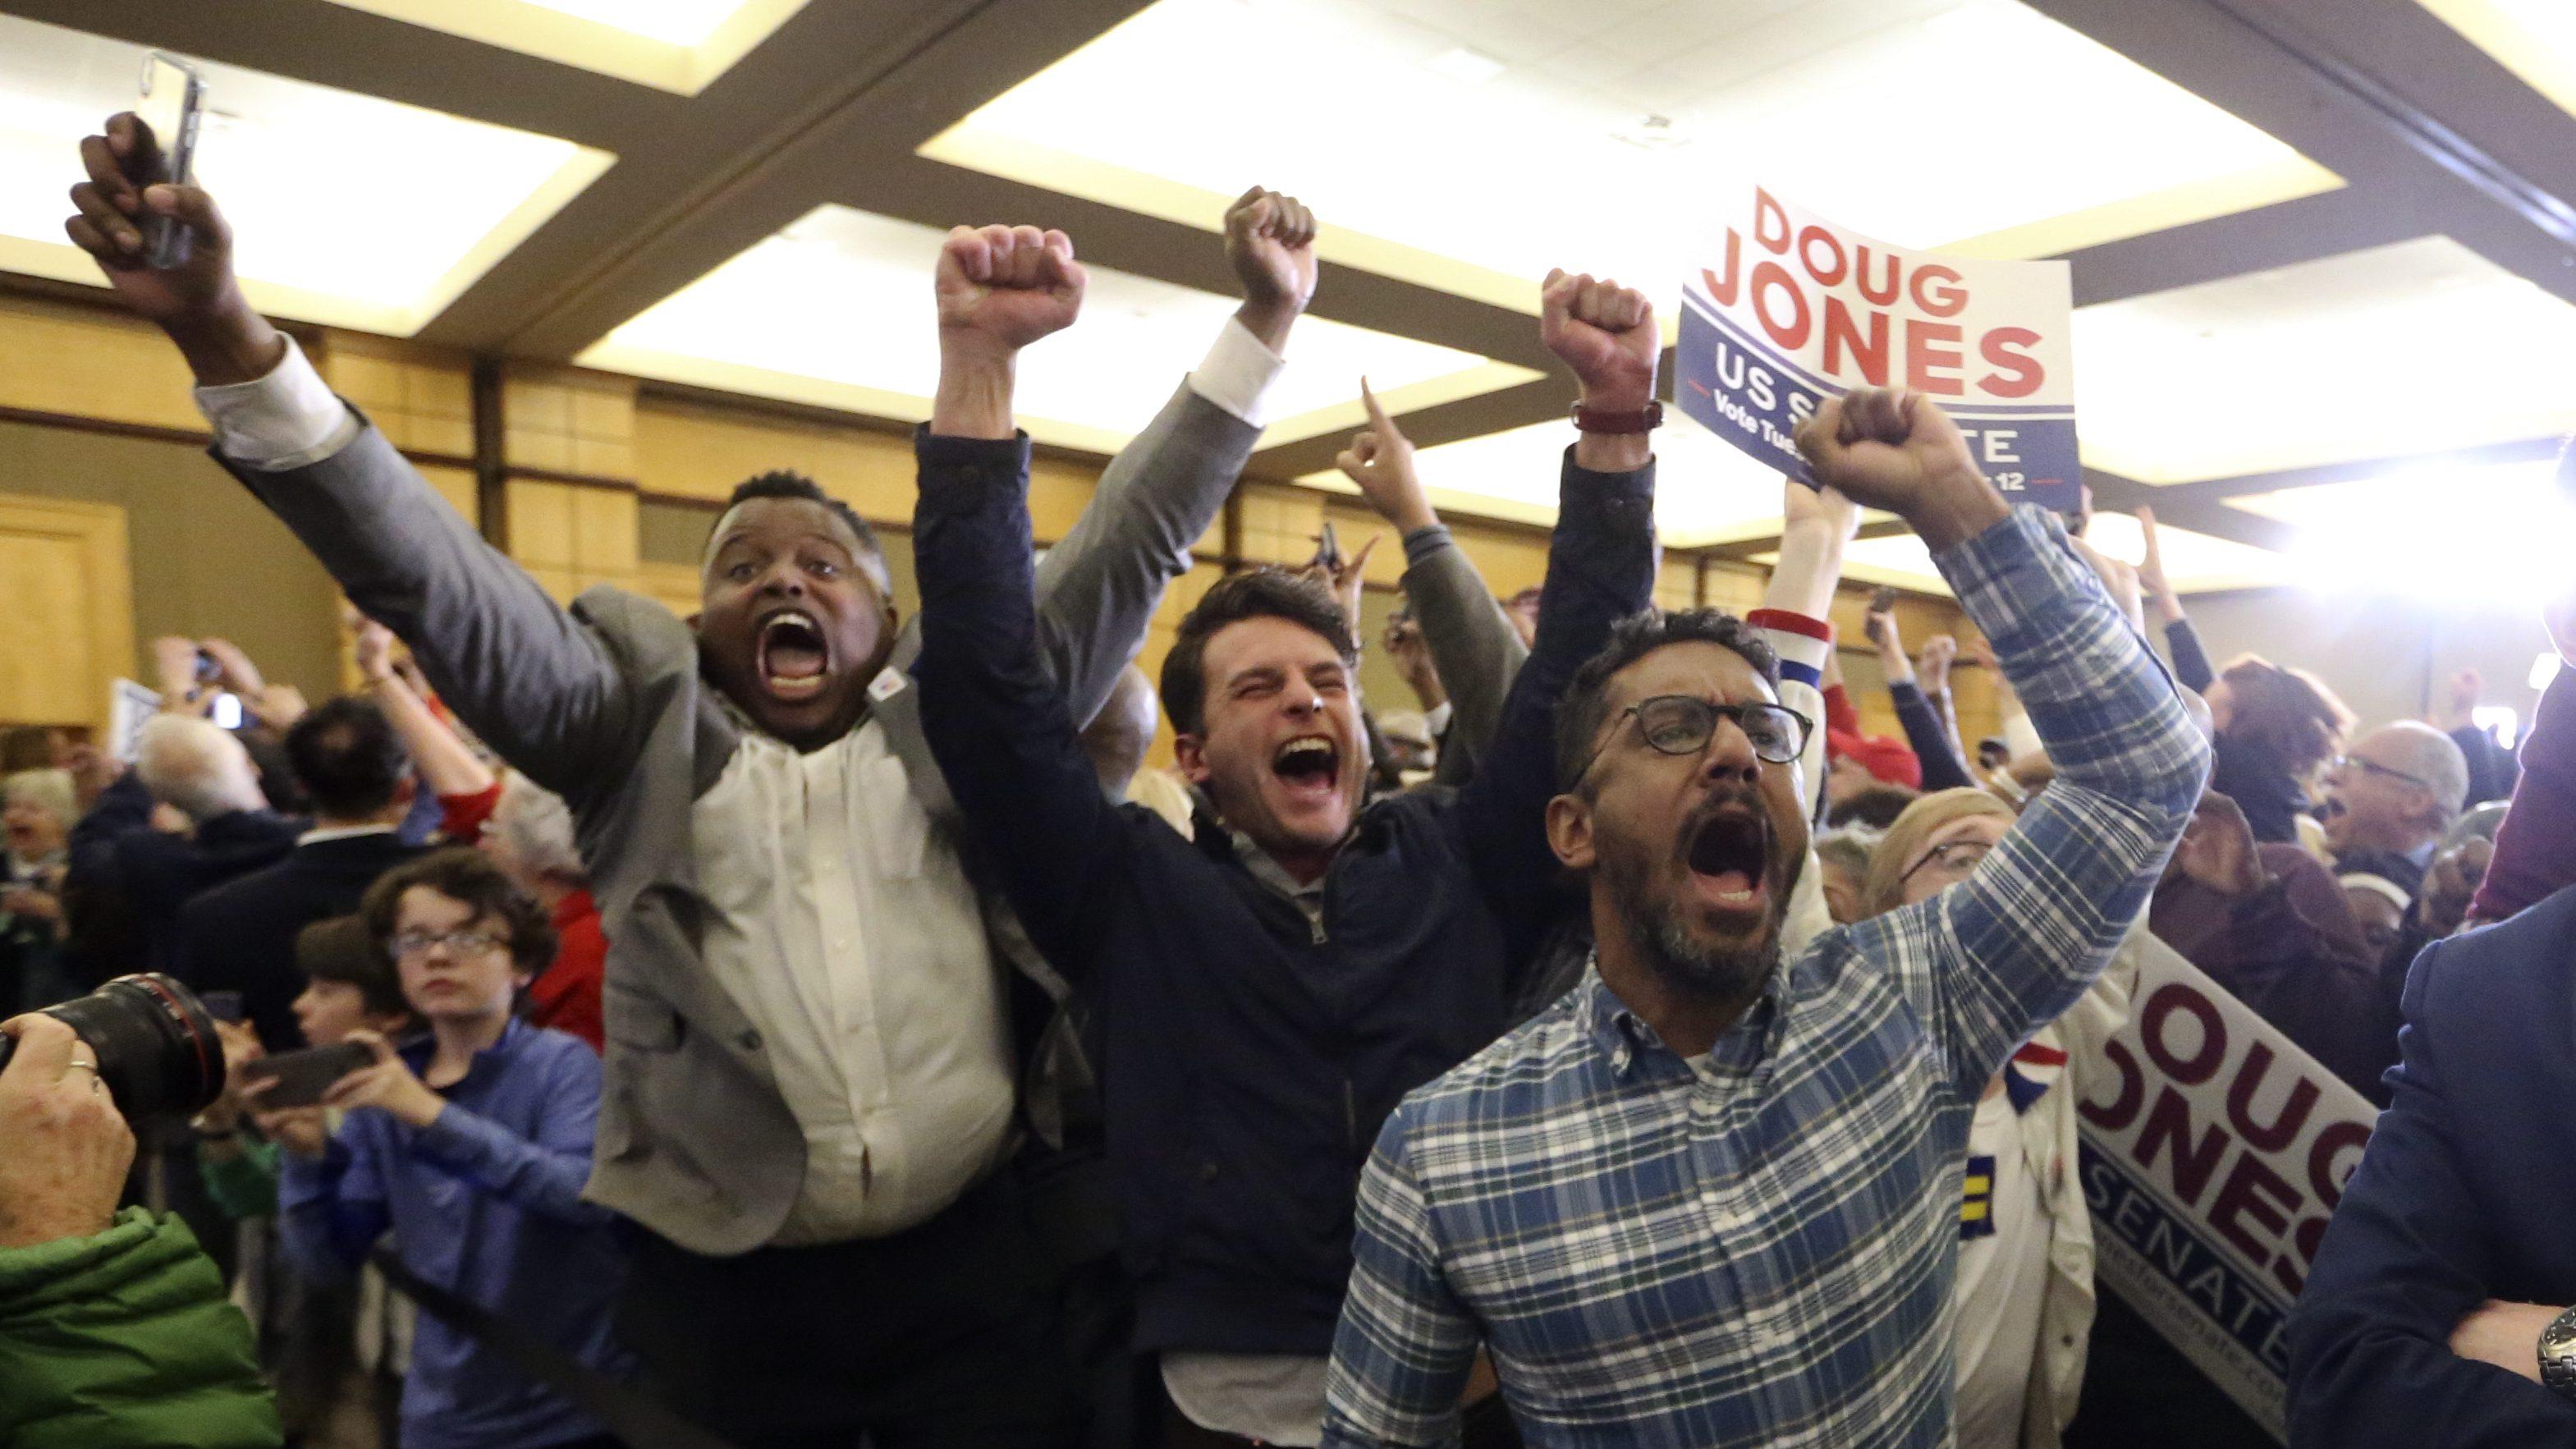 Supporters of Democratic candidate for U.S. Senate Doug Jones